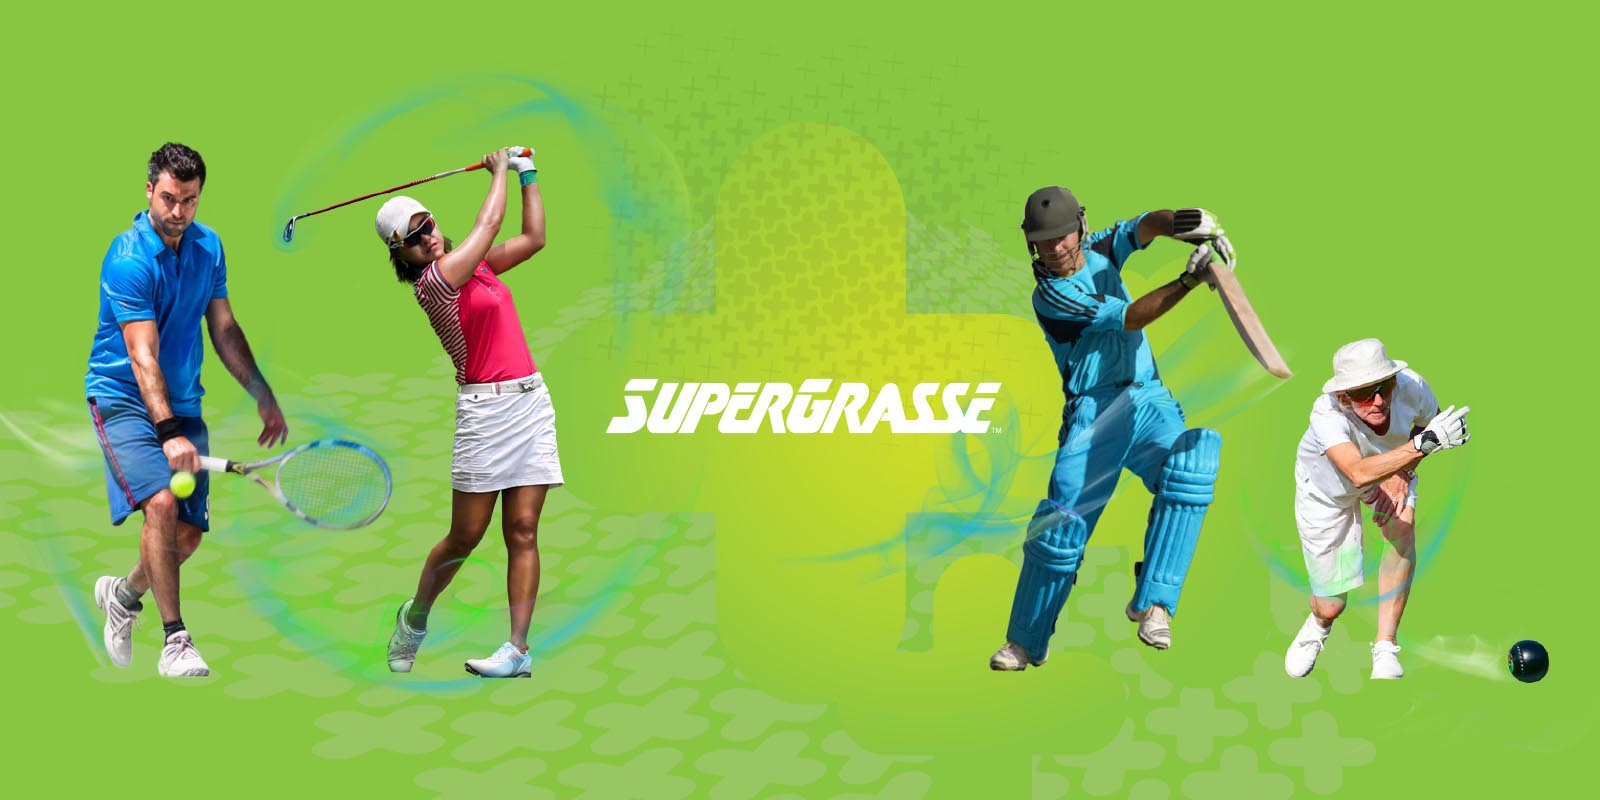 APT Supergrasse Brand